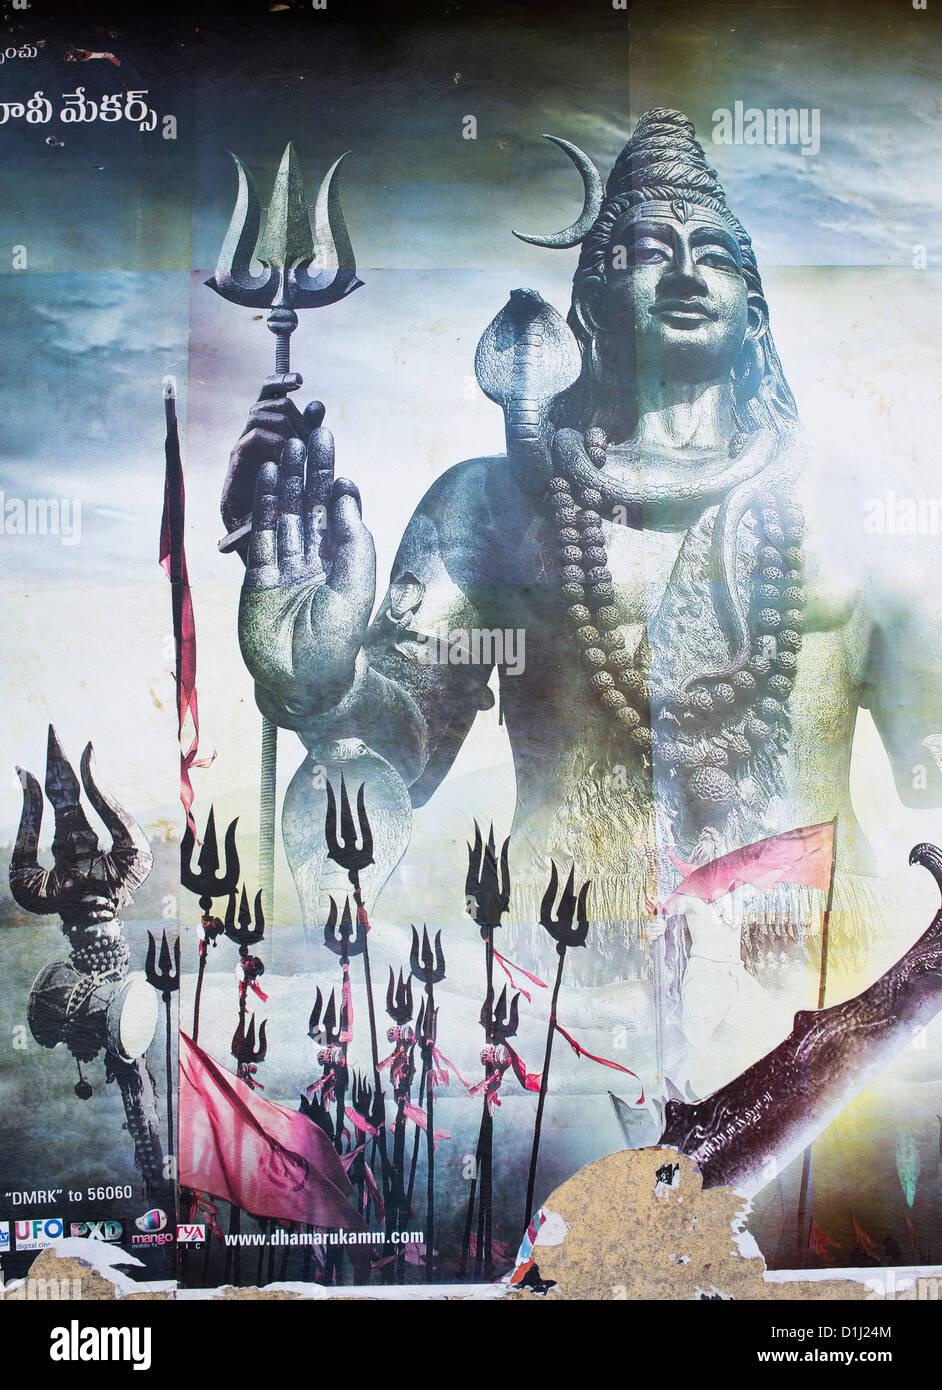 Lord Shiva . Indian movie poster.  Andhra Pradesh, India - Stock Image